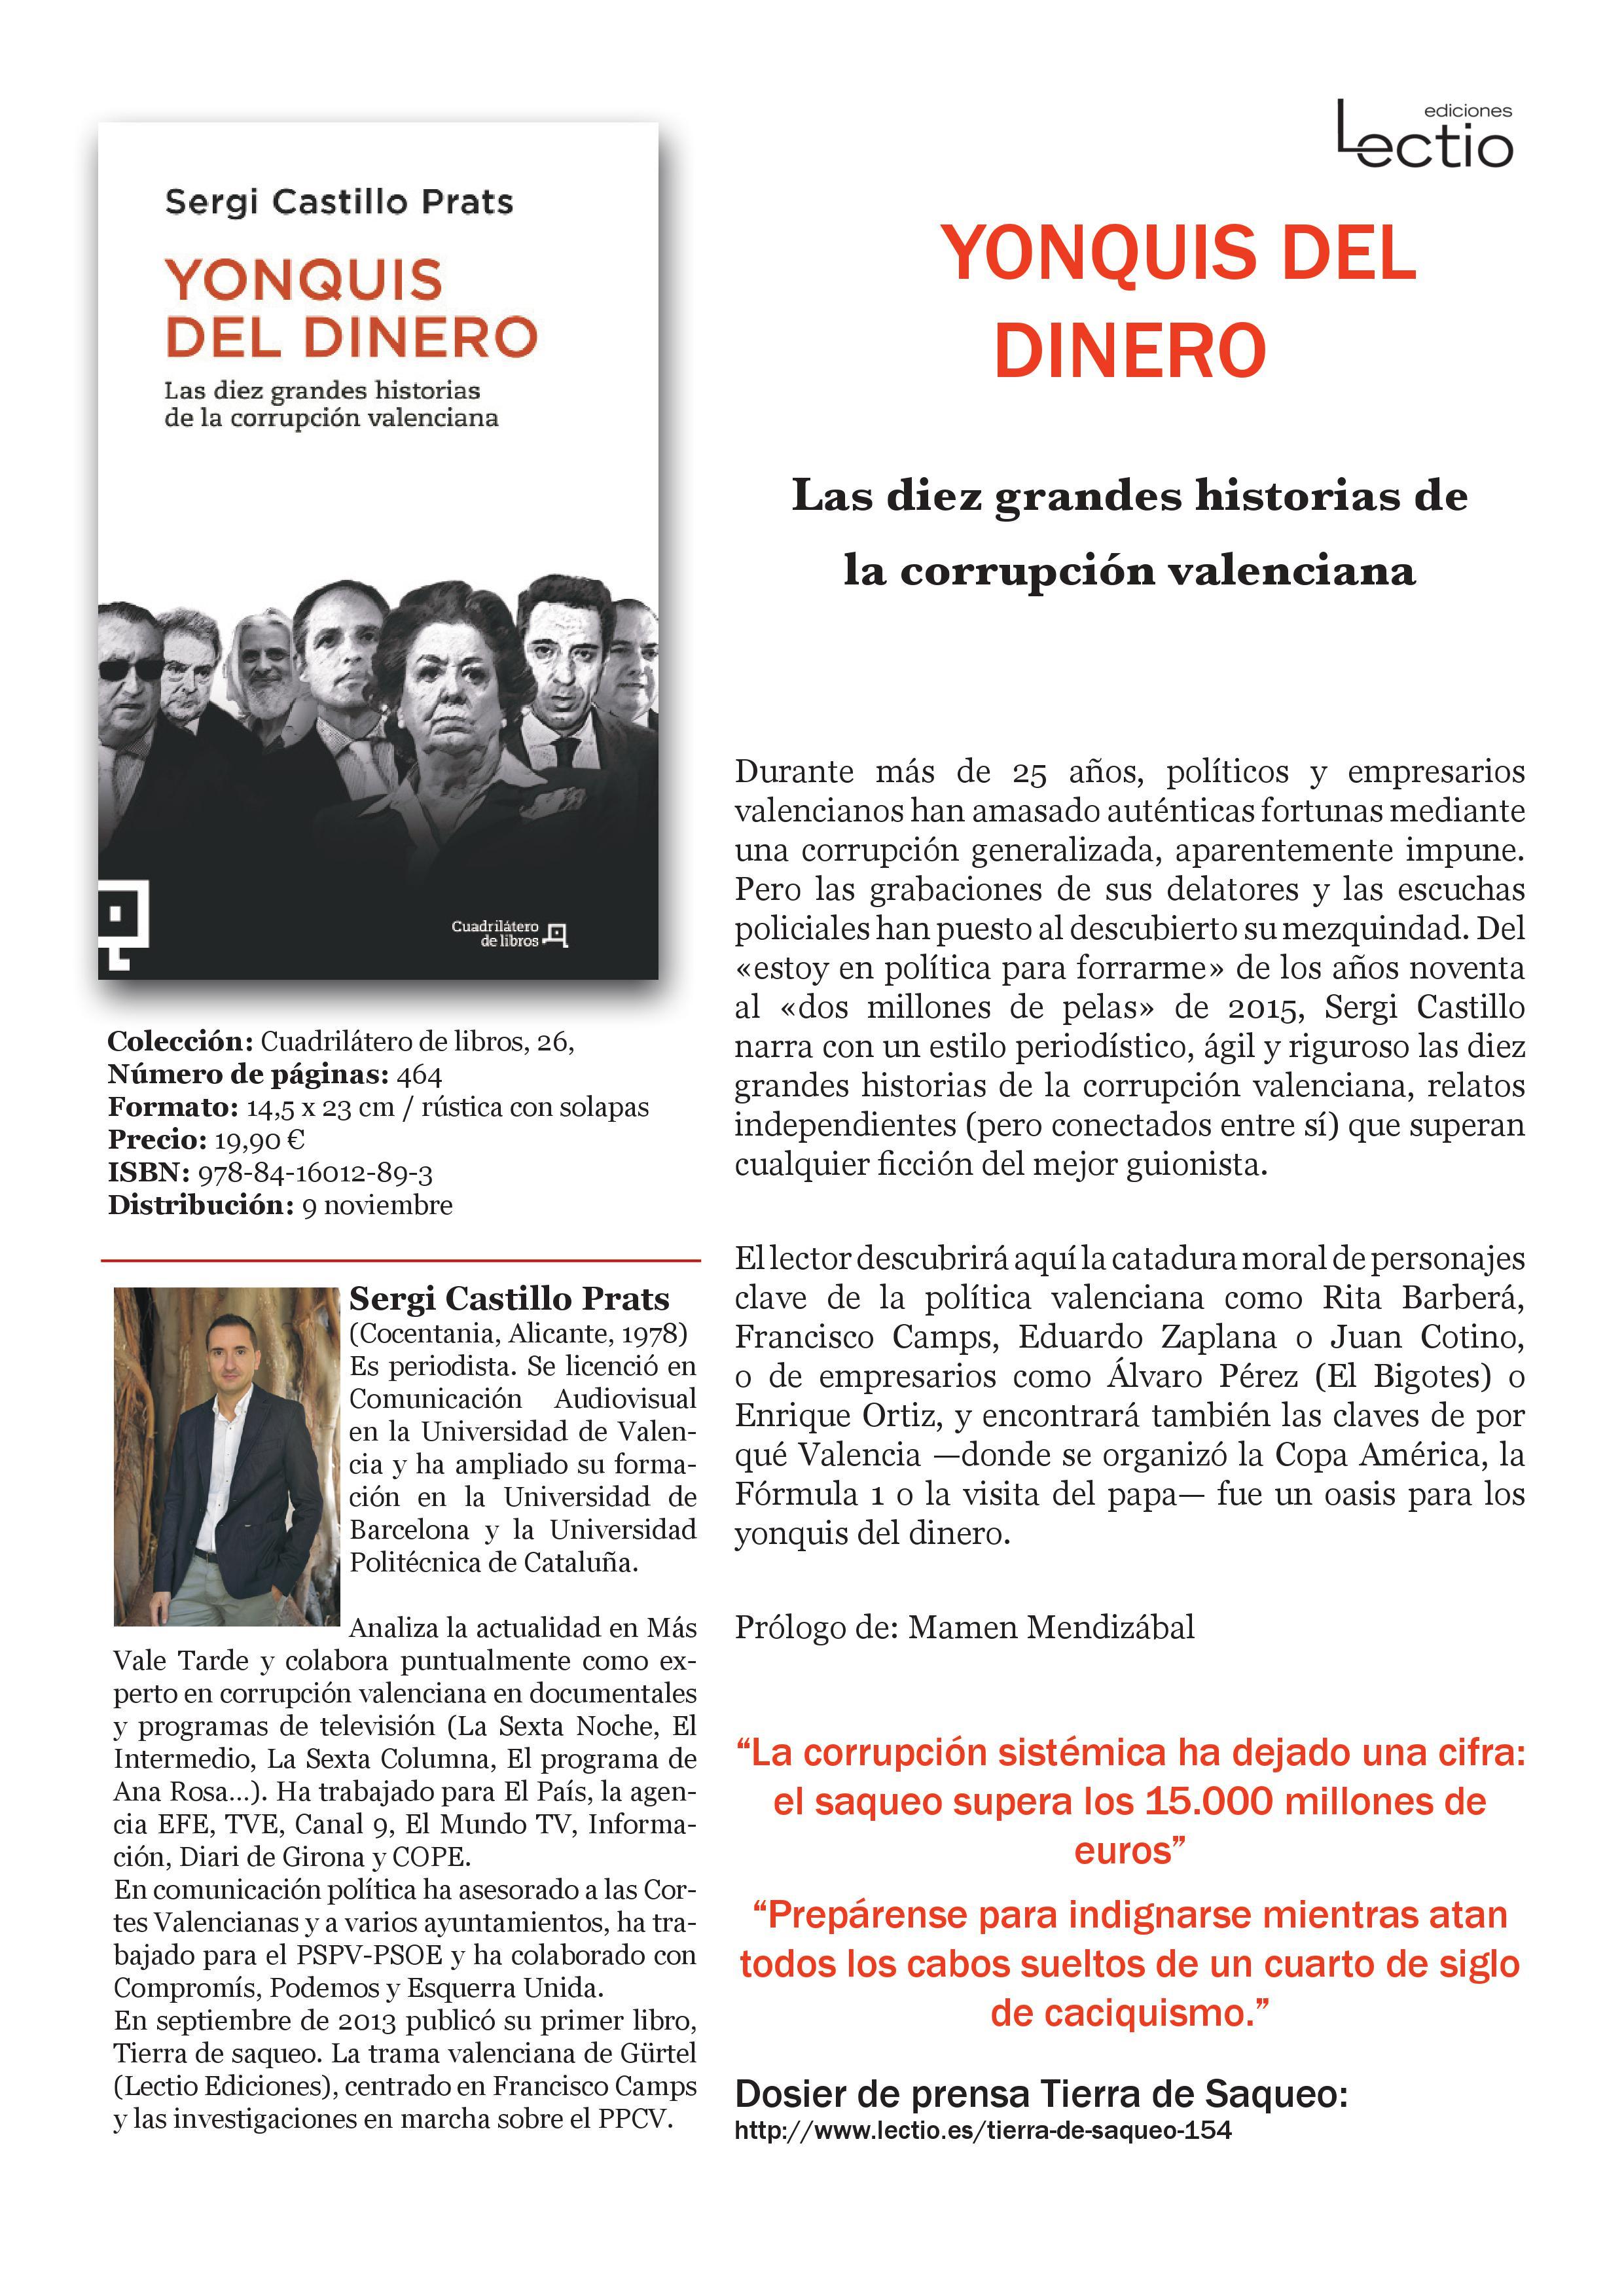 yonkis-del-dinero-ndp